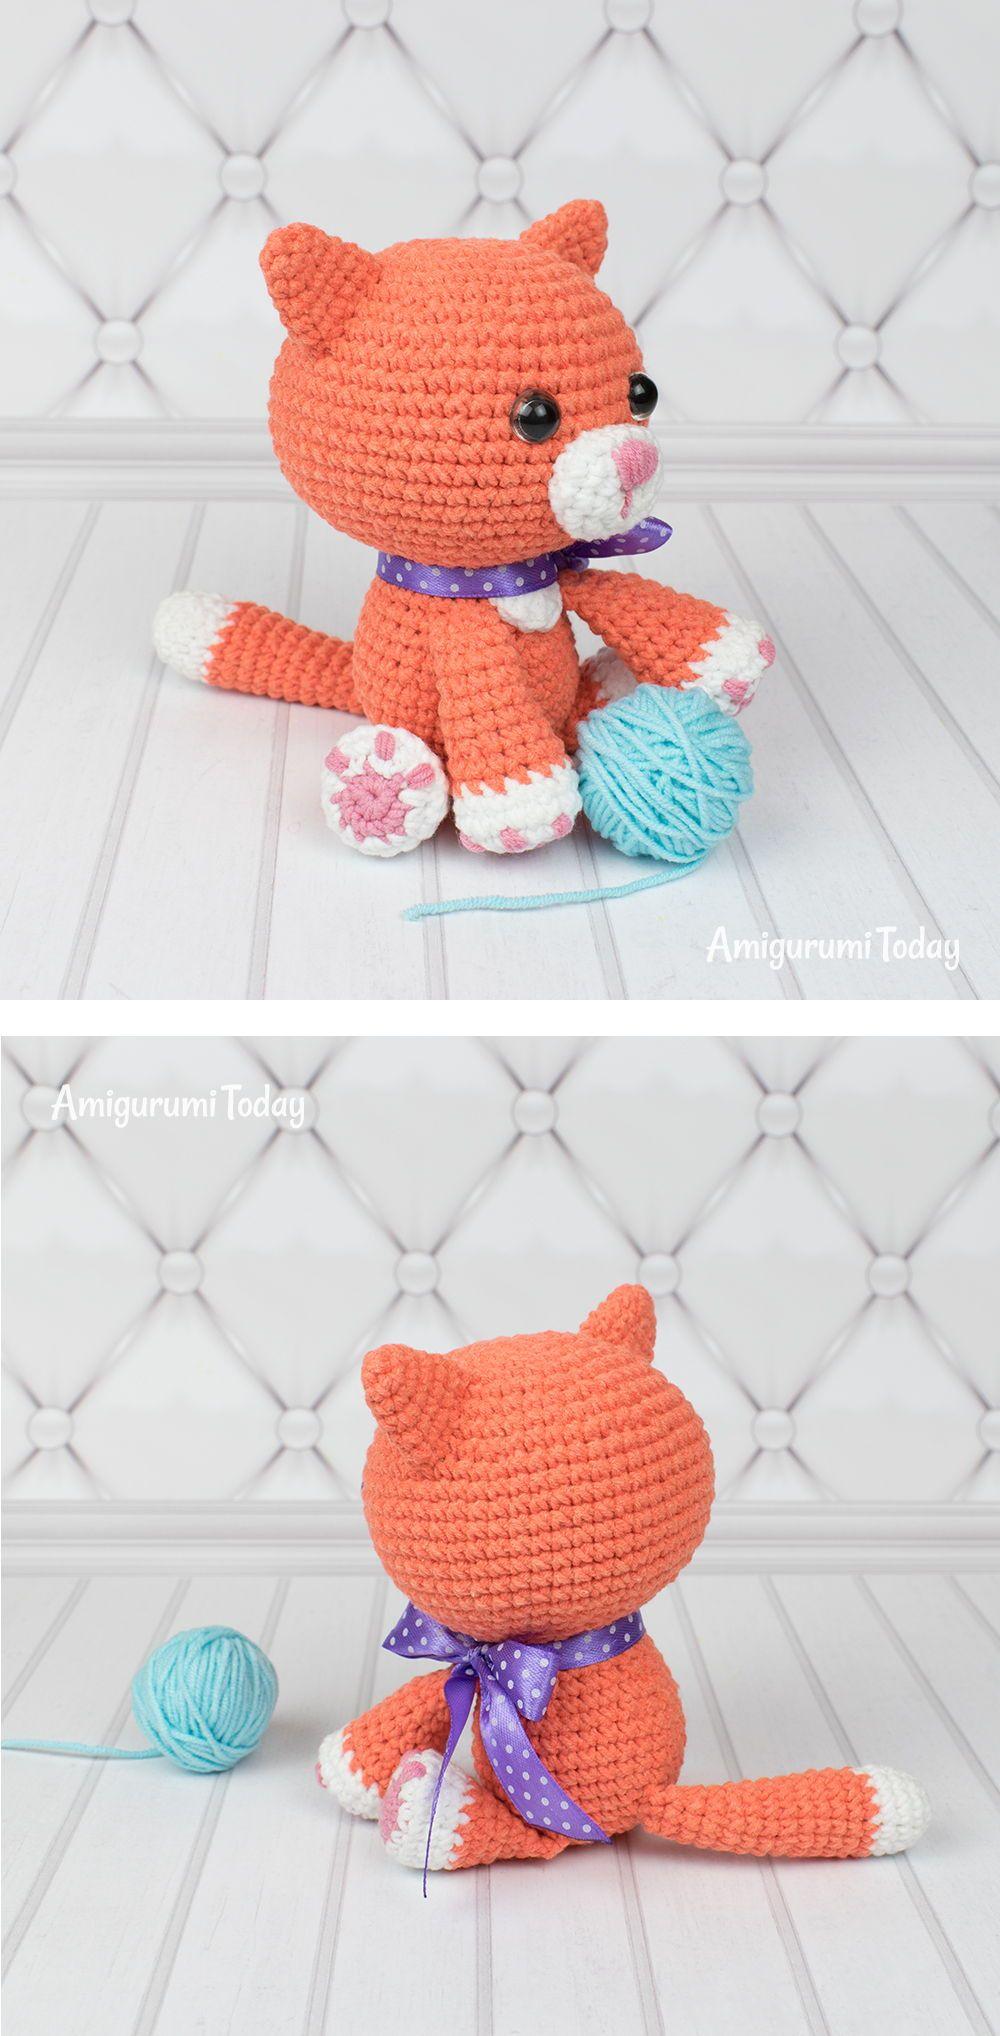 Ginger Cat Amigurumi Pattern Crochet Crochet Patterns Free Crochet